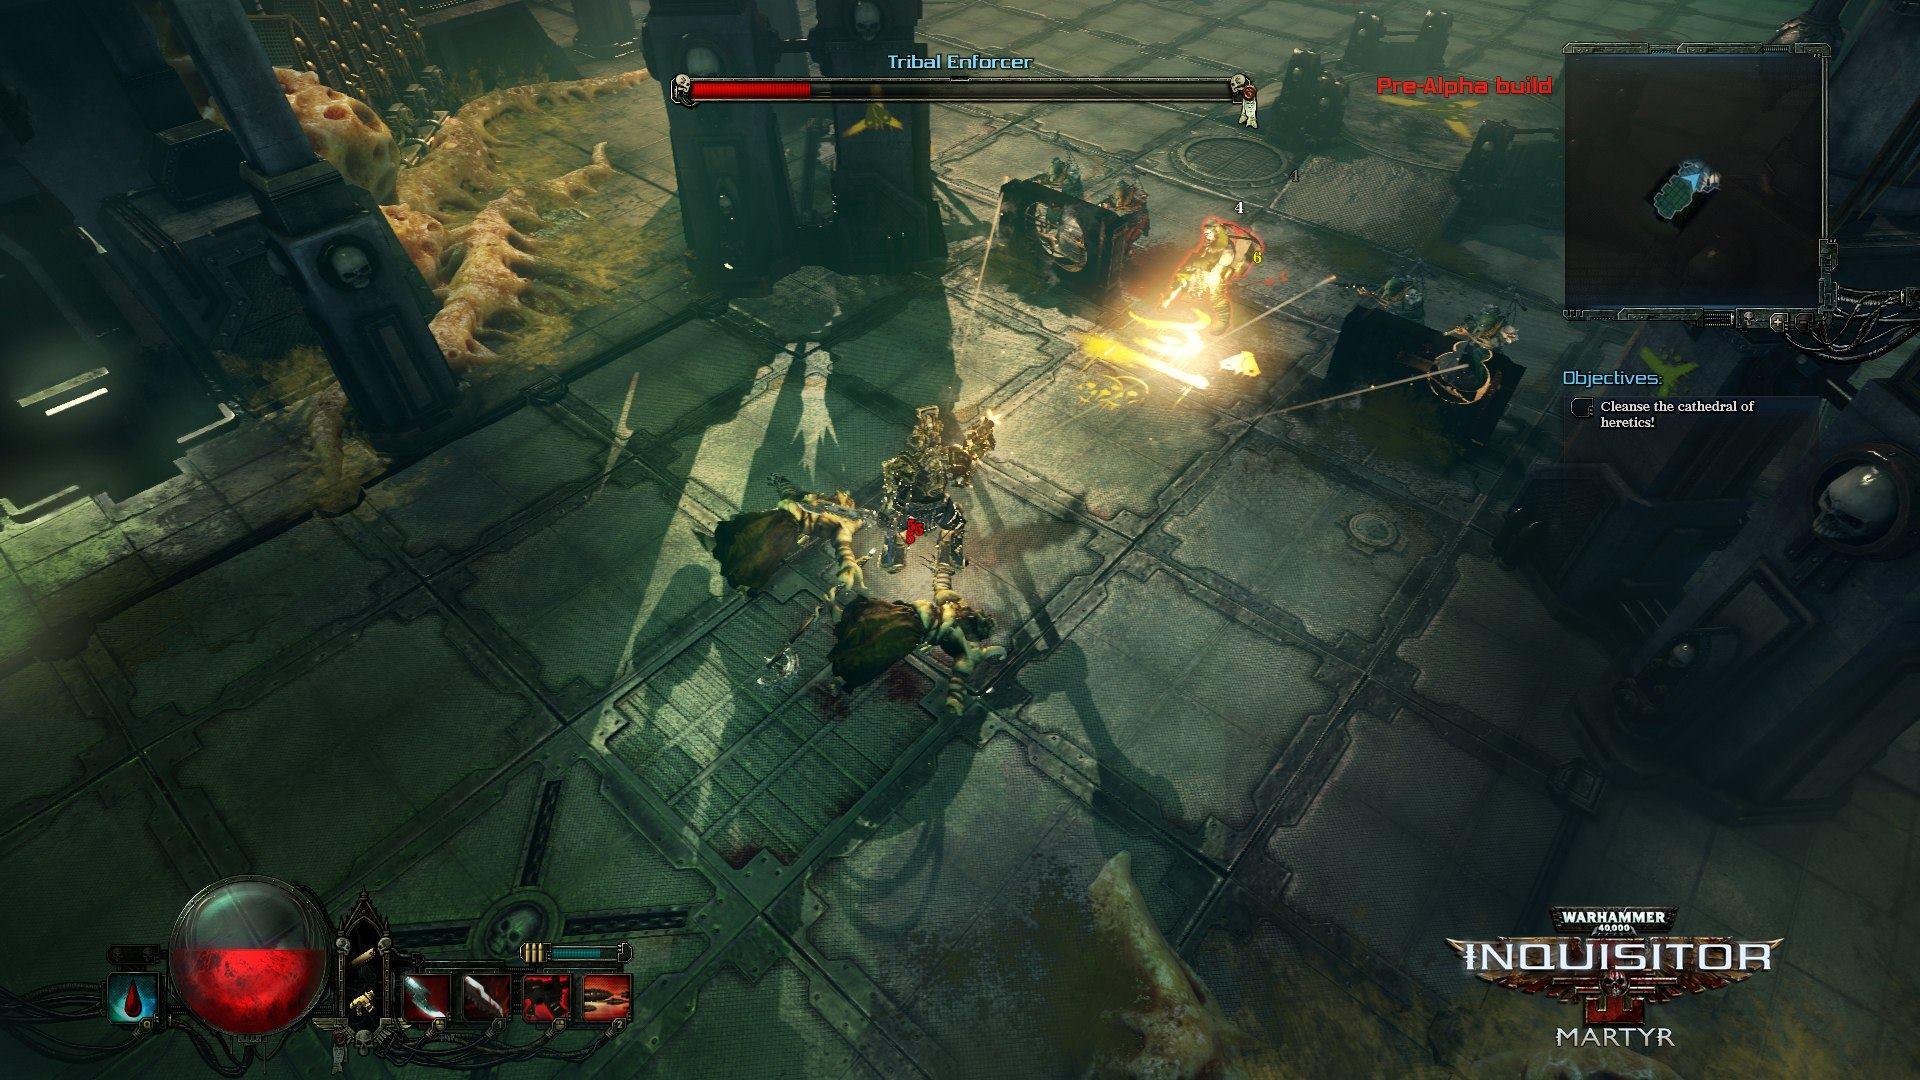 [Jeu vidéo] Warhammer 40,000: Inquisitor – Martyr 529433117920358696652897356088211436127432852558o